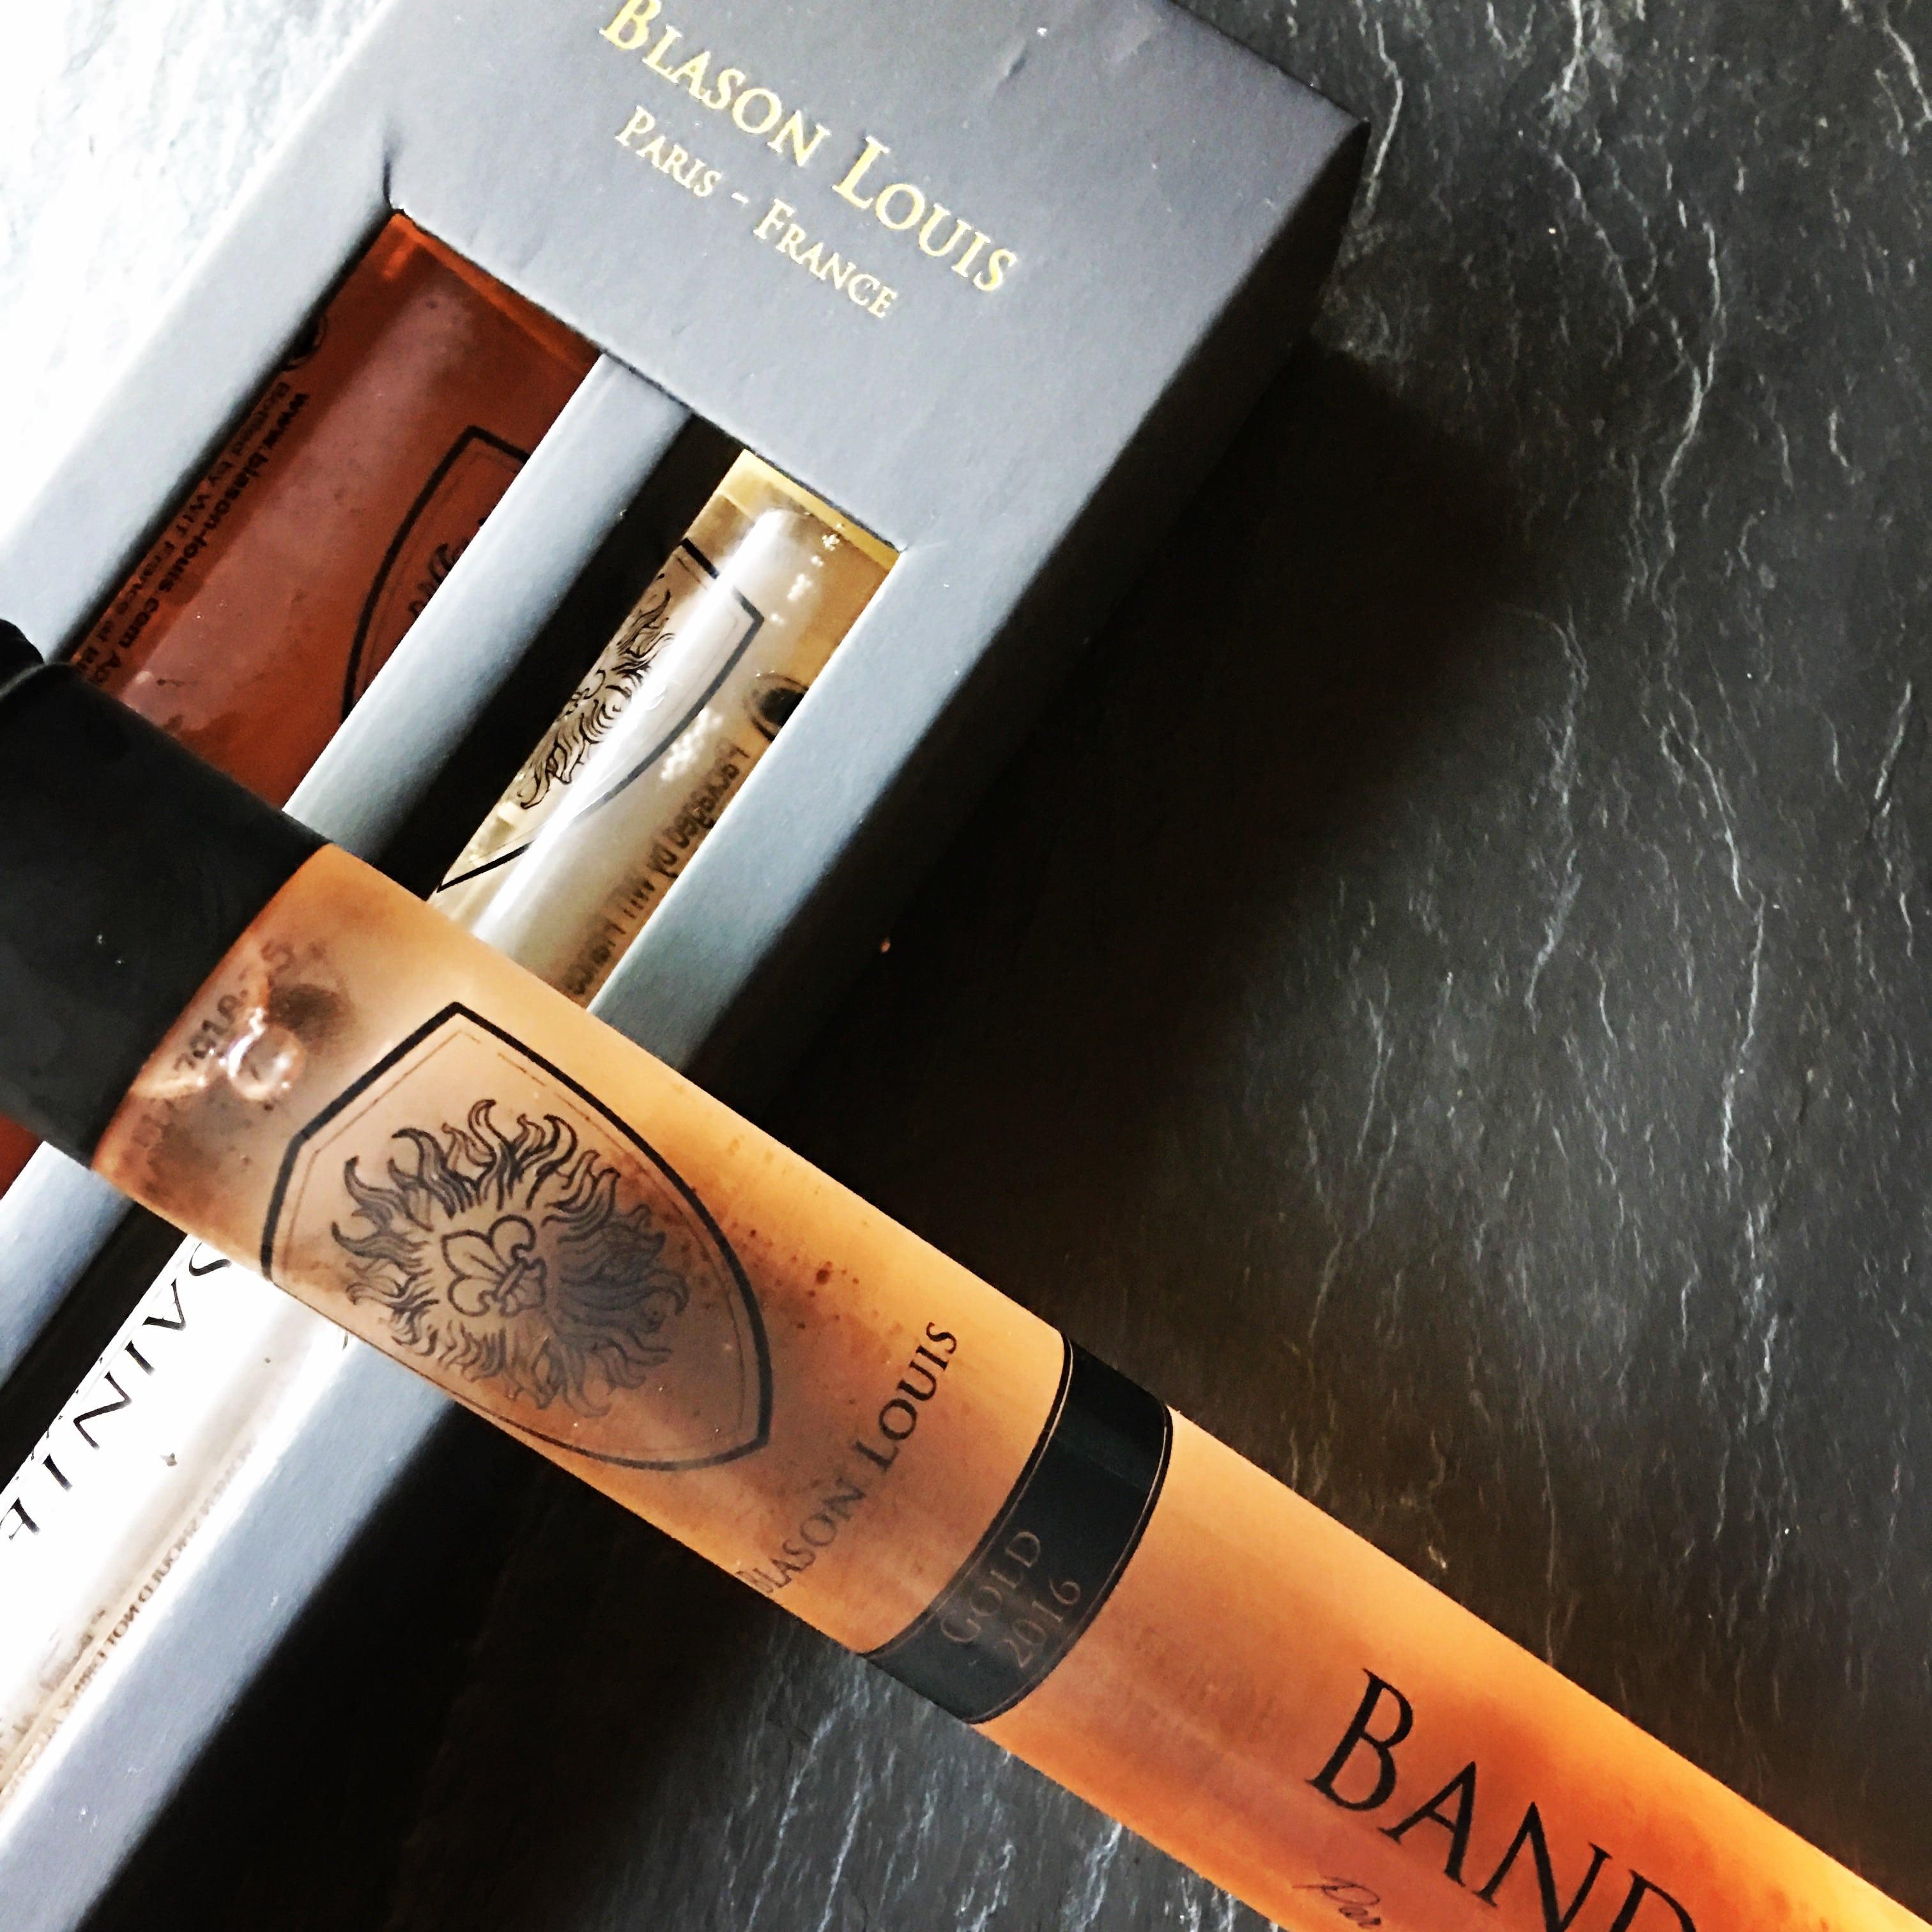 Blason-Louis Bandol Rosé 2015 (Flacon)